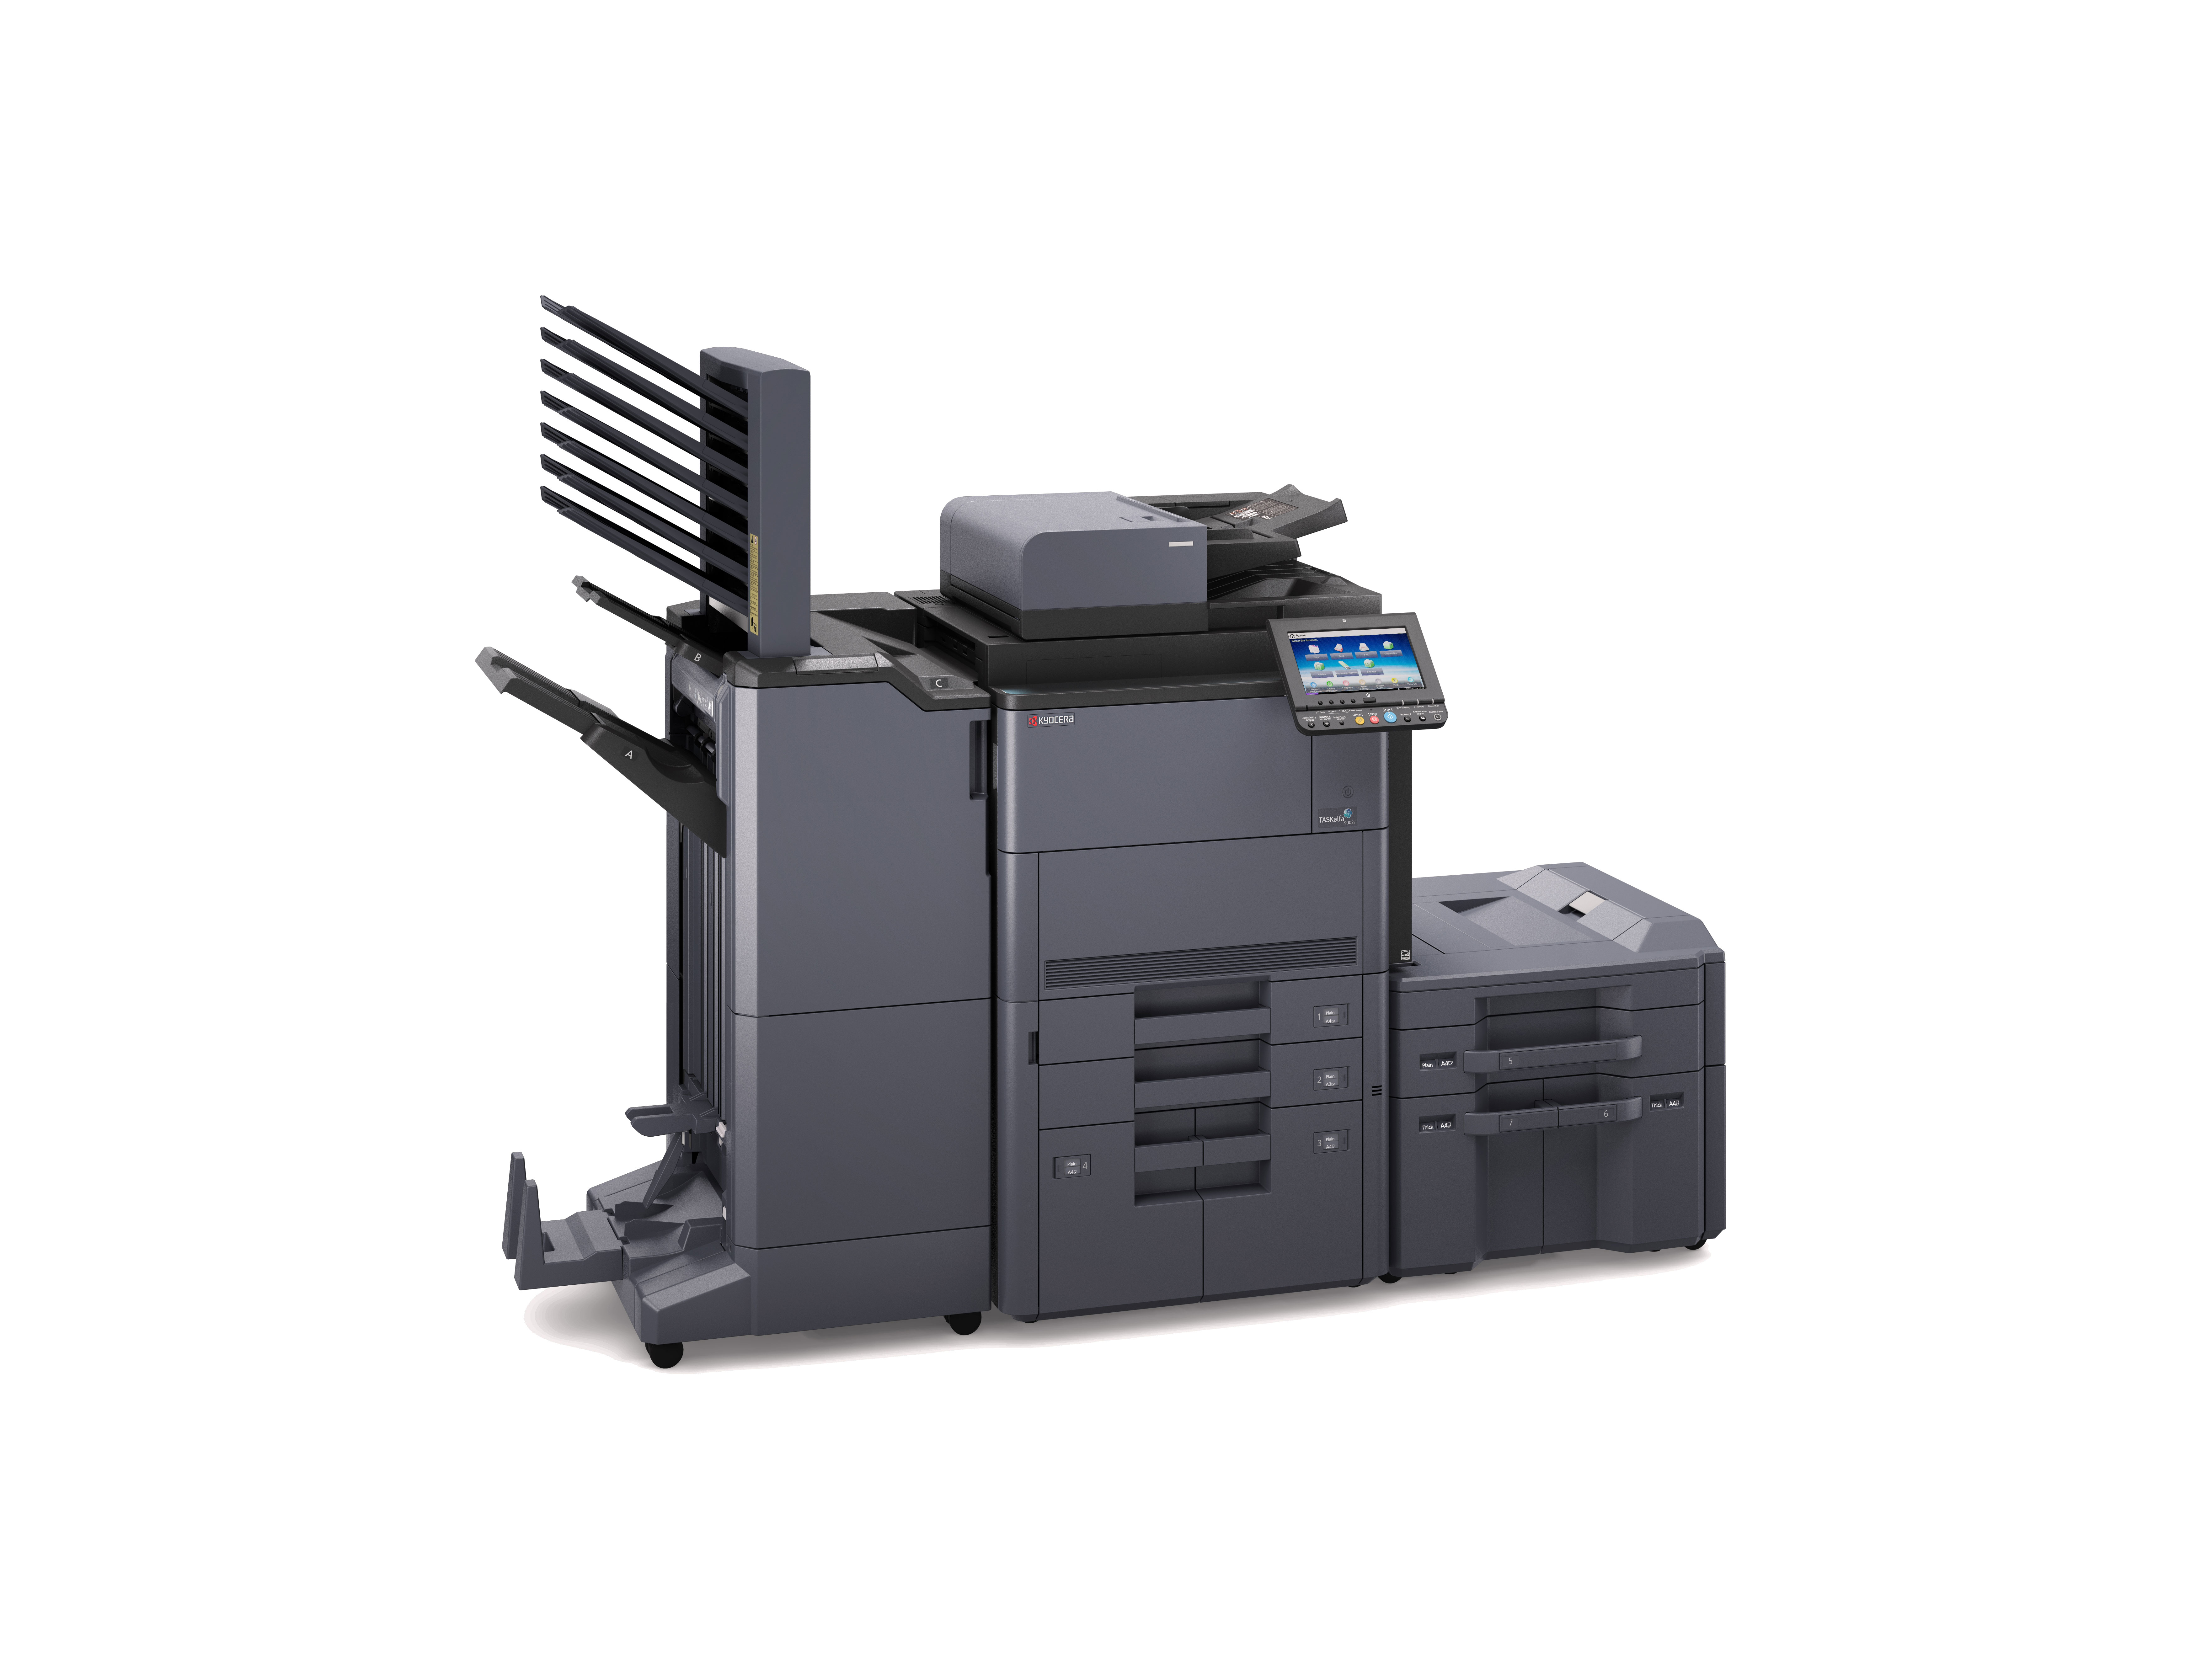 Fotocopiadora TASKalfa 9002i usada